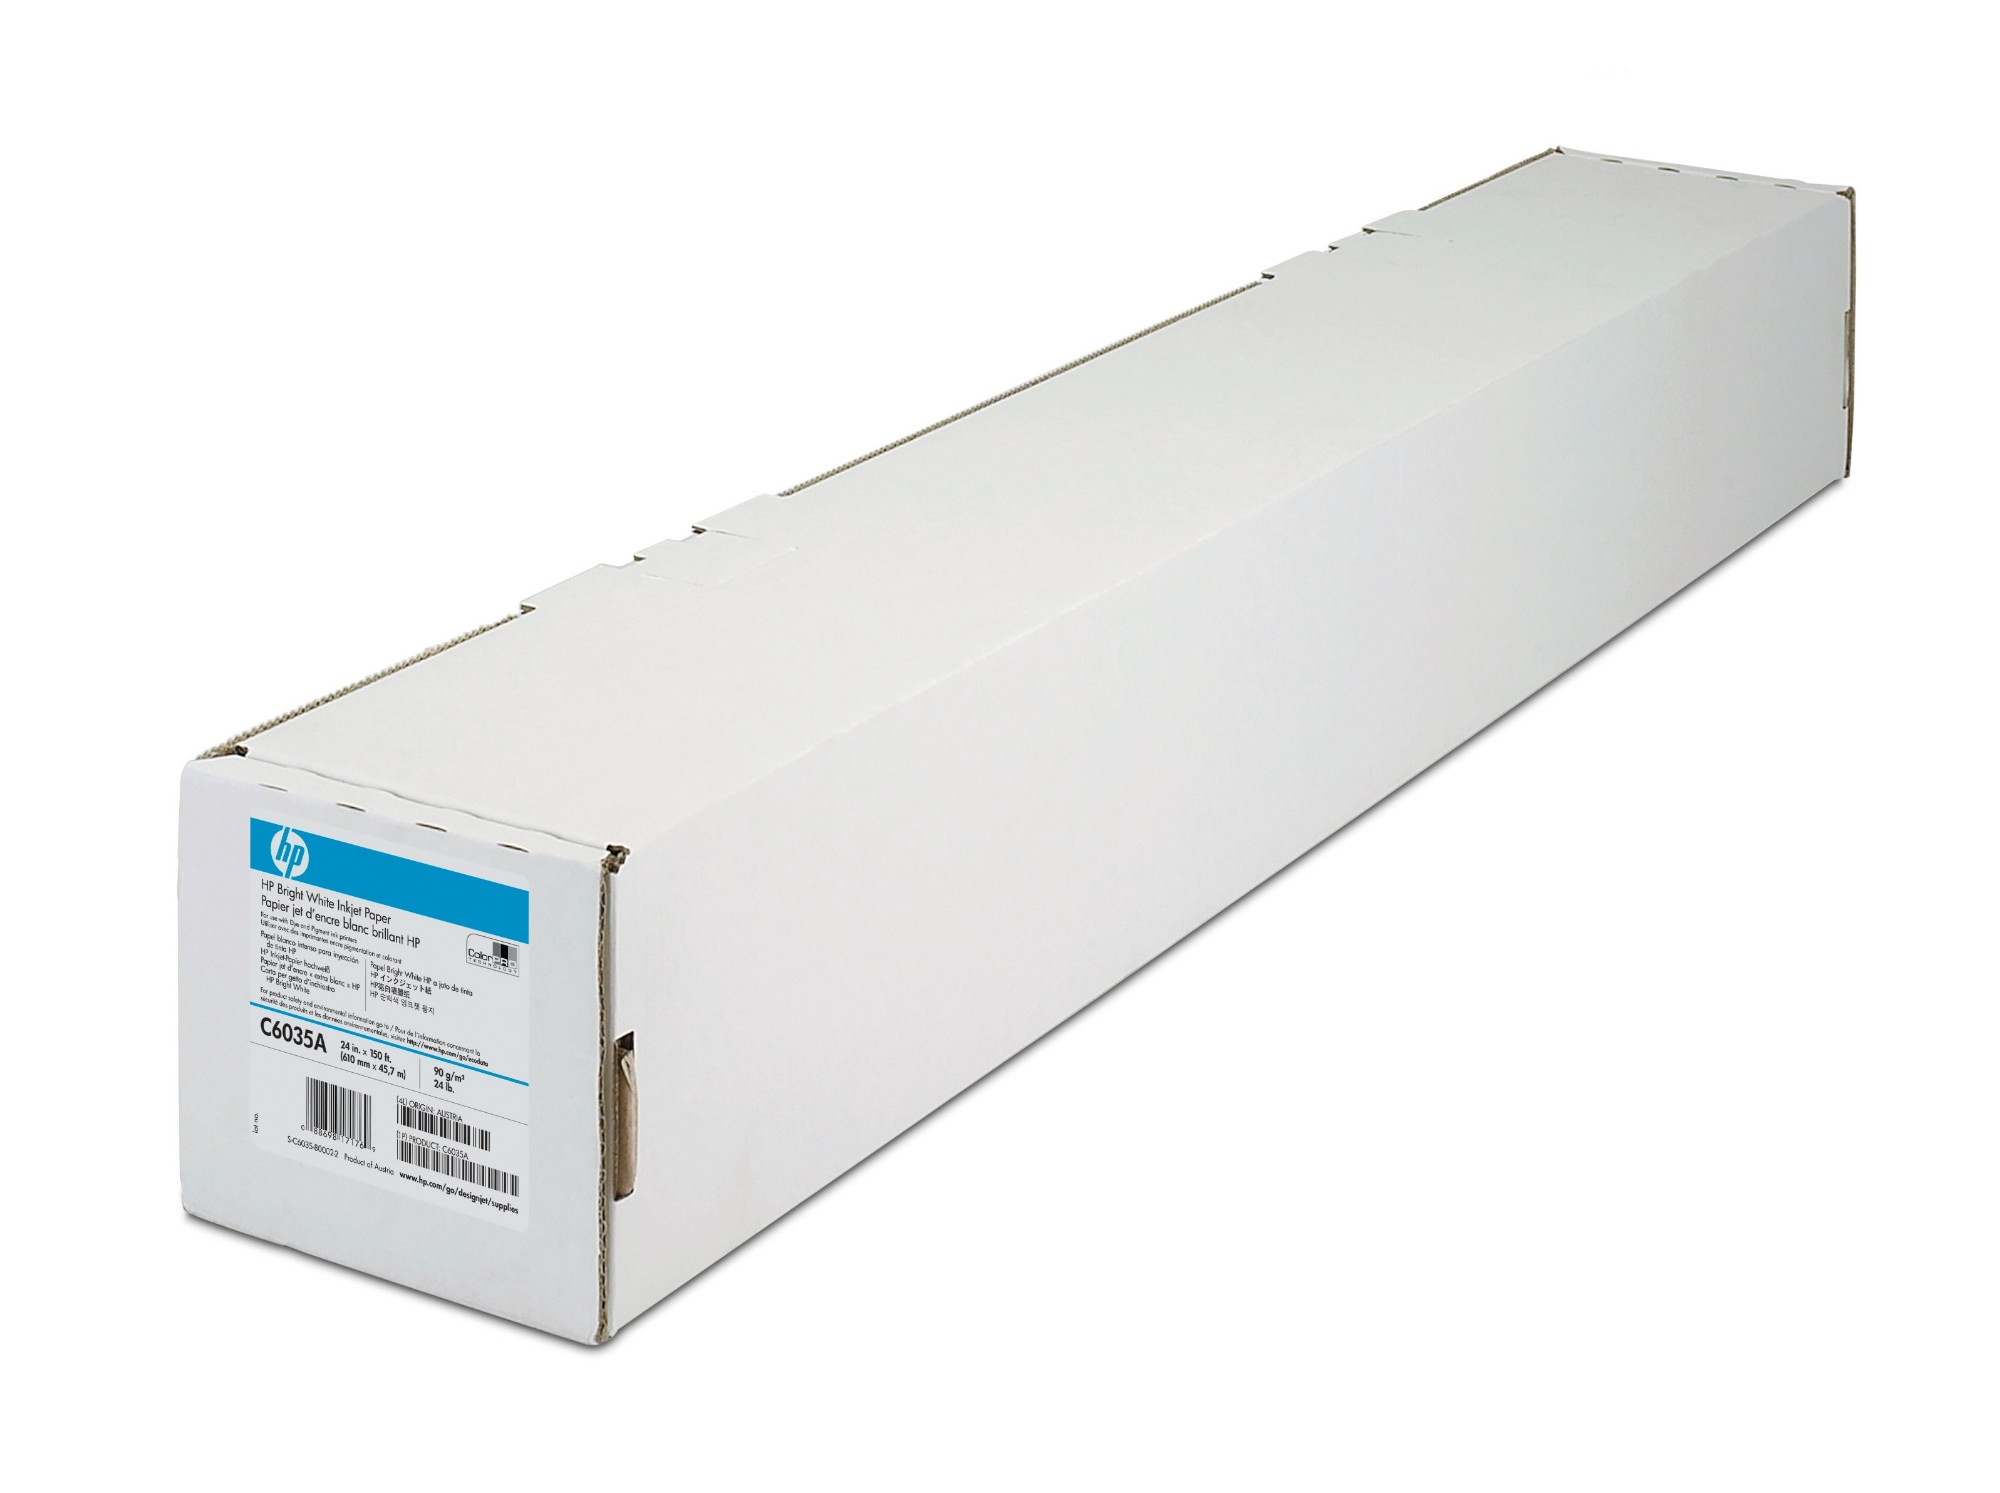 HP Q1446A plotter paper 45 m 42 cm